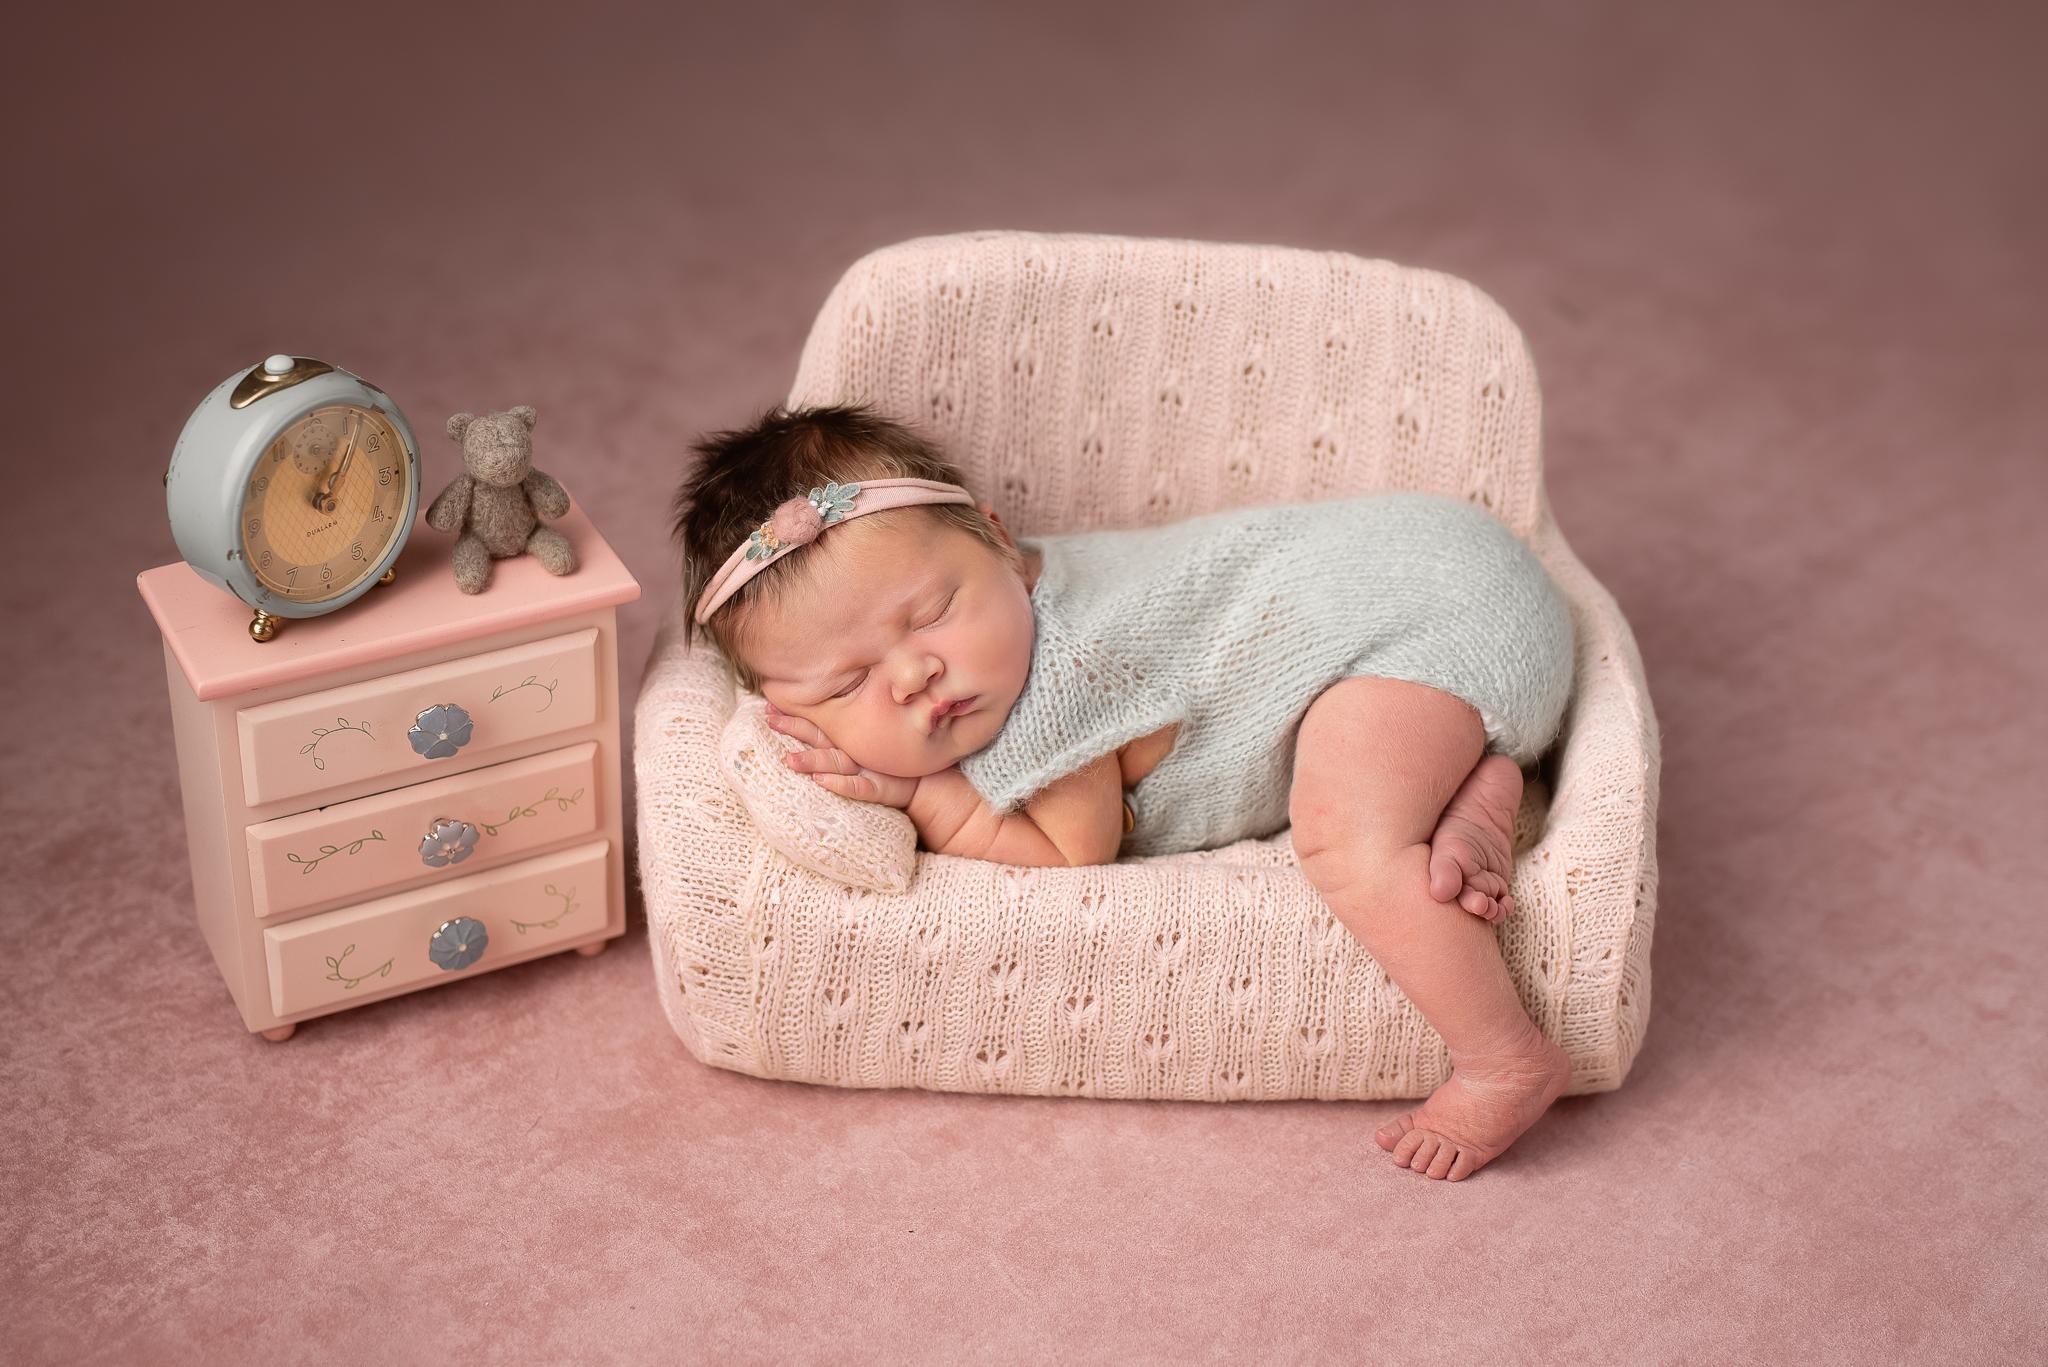 Newborn259NaomiLuciennePhotography062019-Edita.jpg